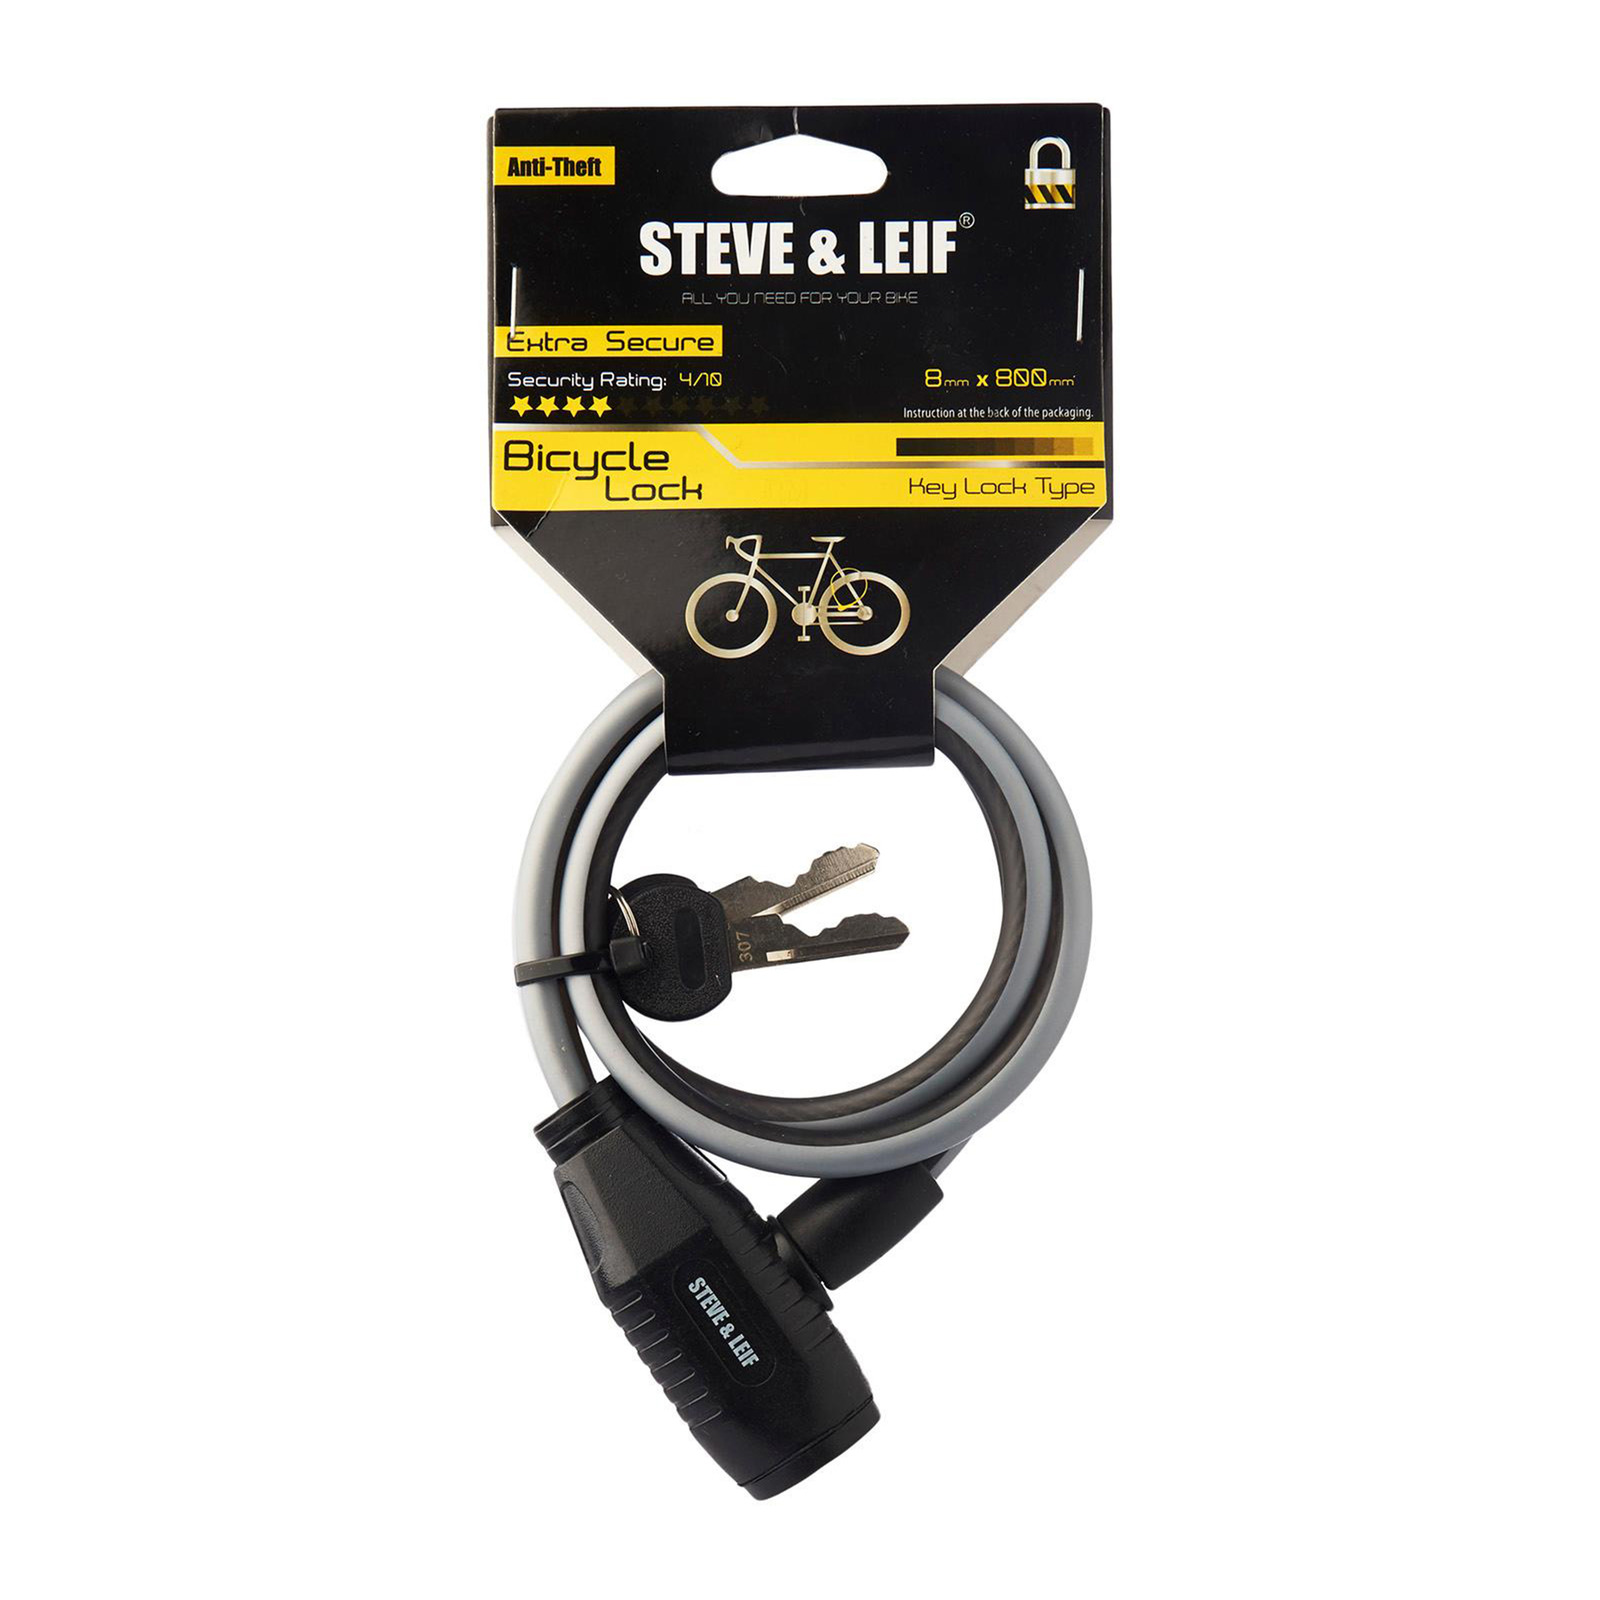 Steve & Leif Bicycle Key Lock (8mmx800mm)